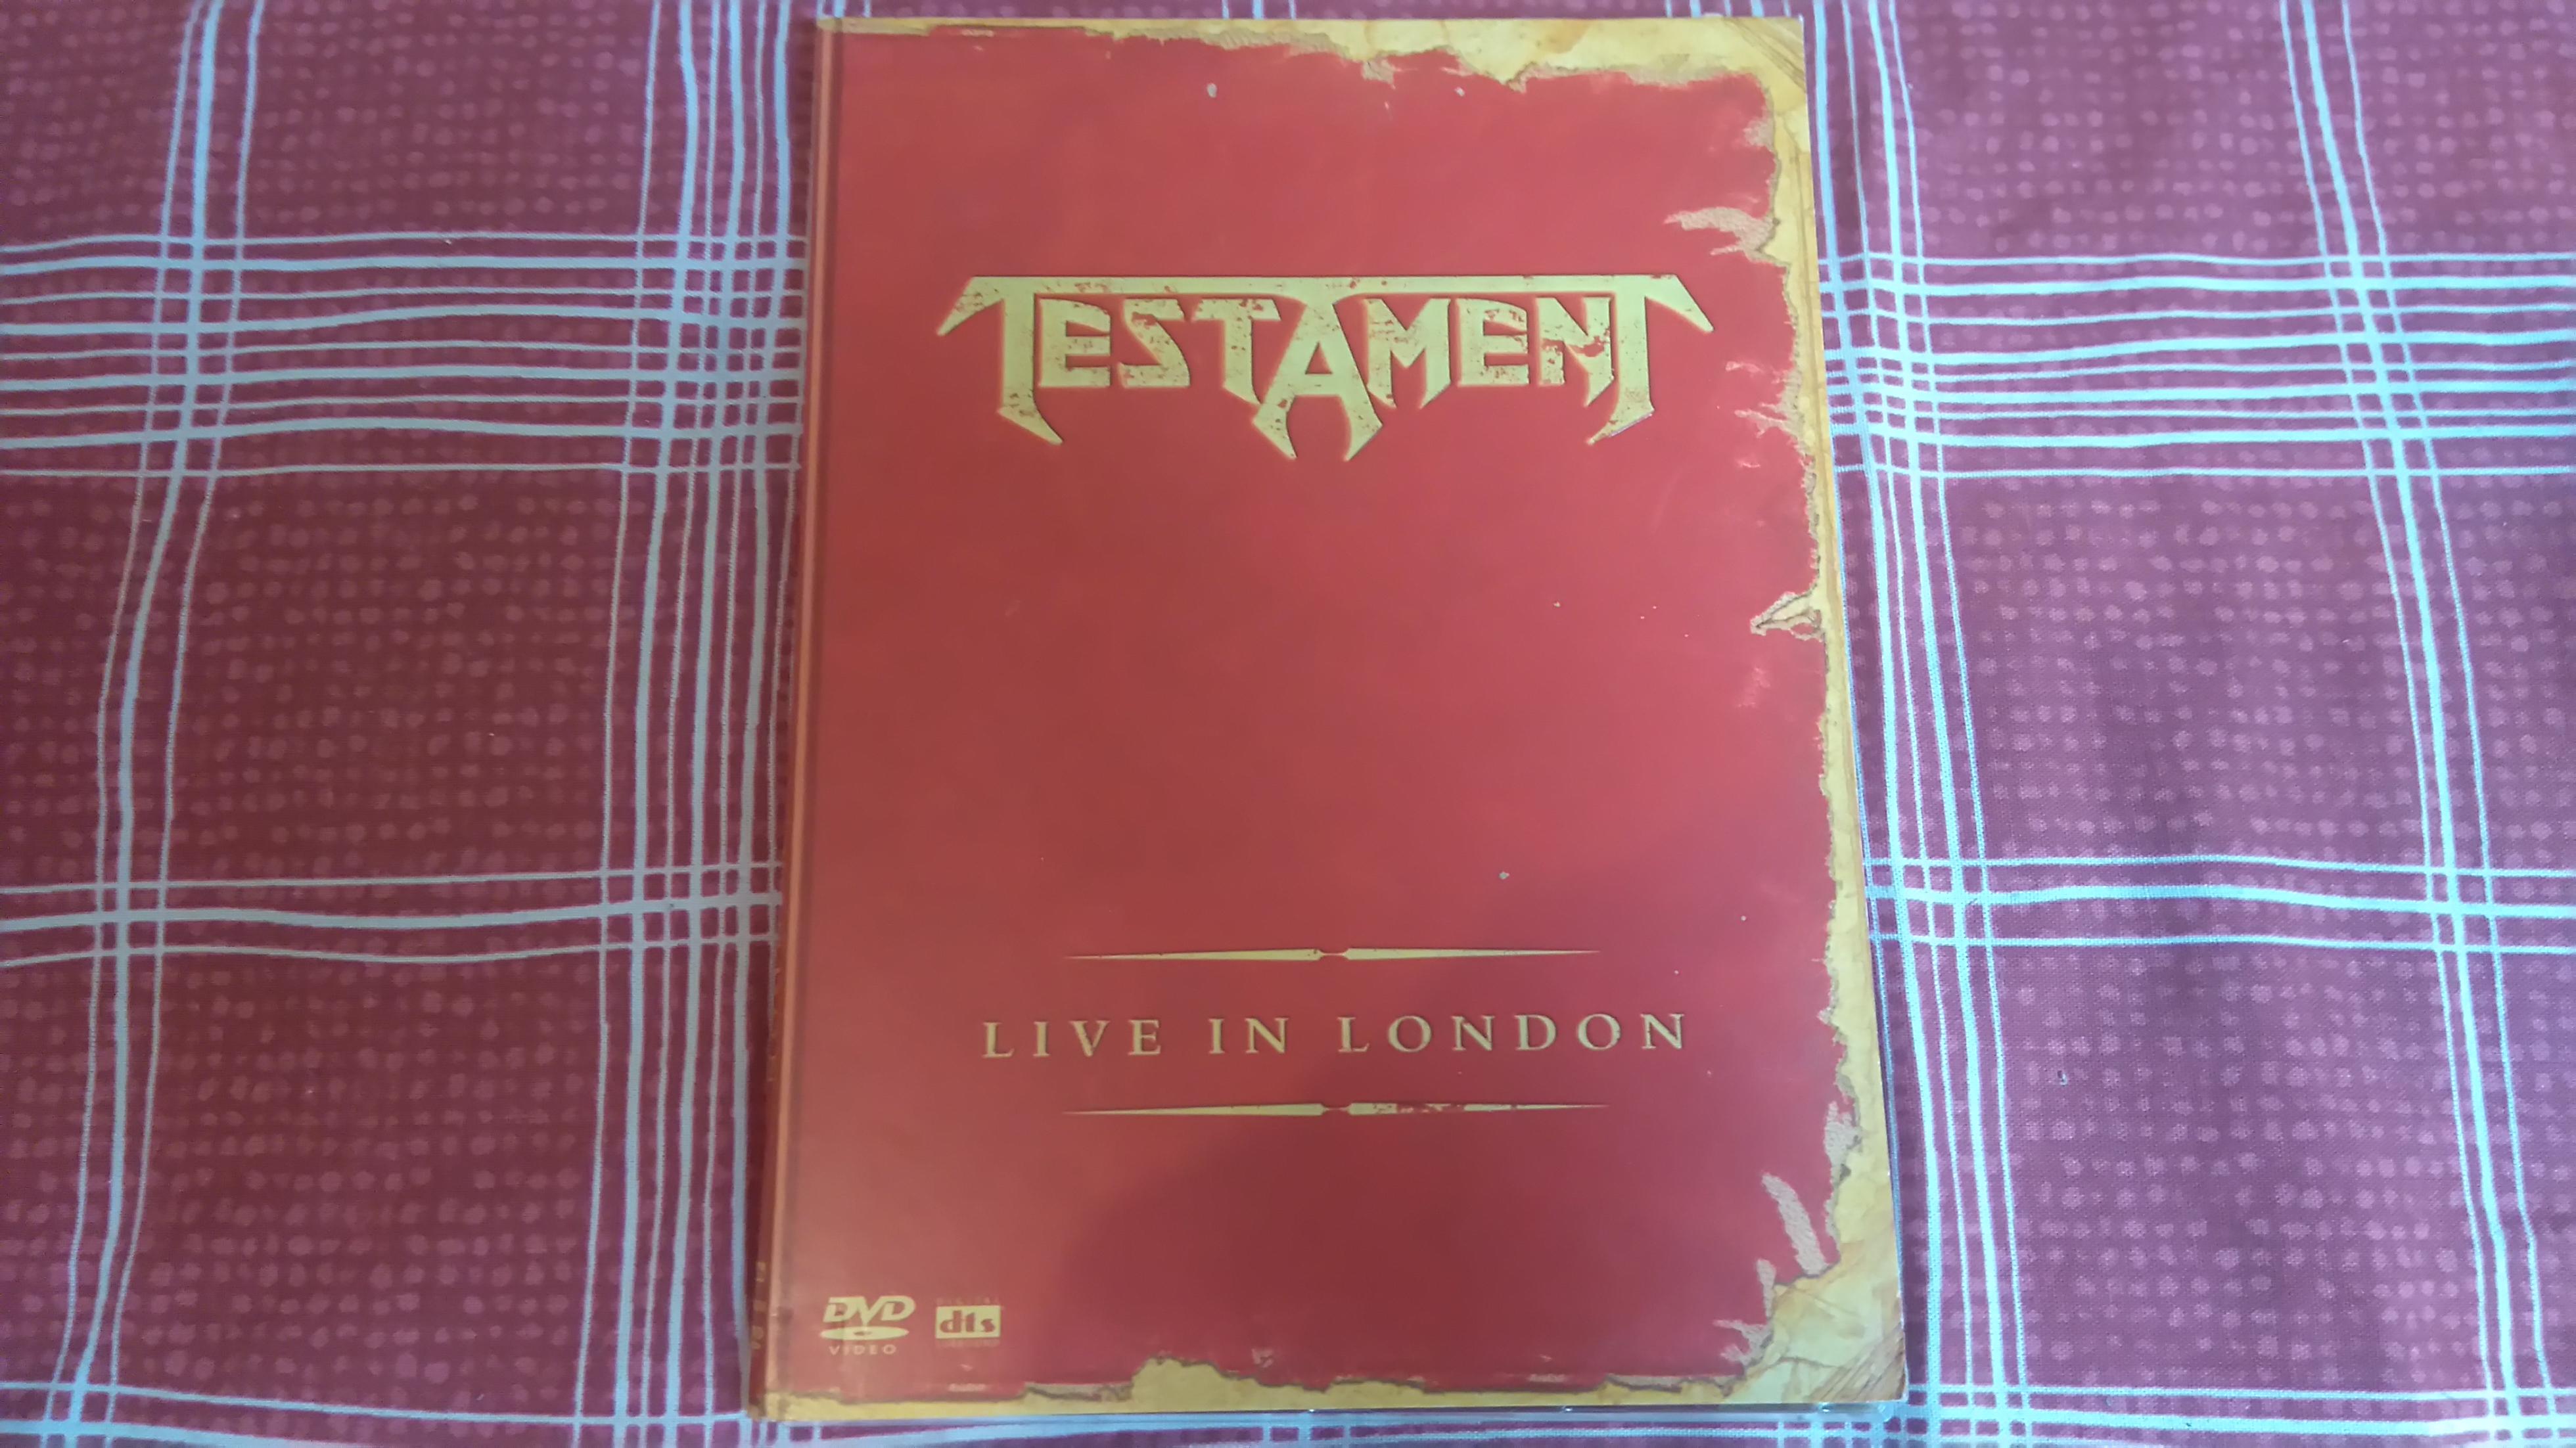 Testament DVD.JPG